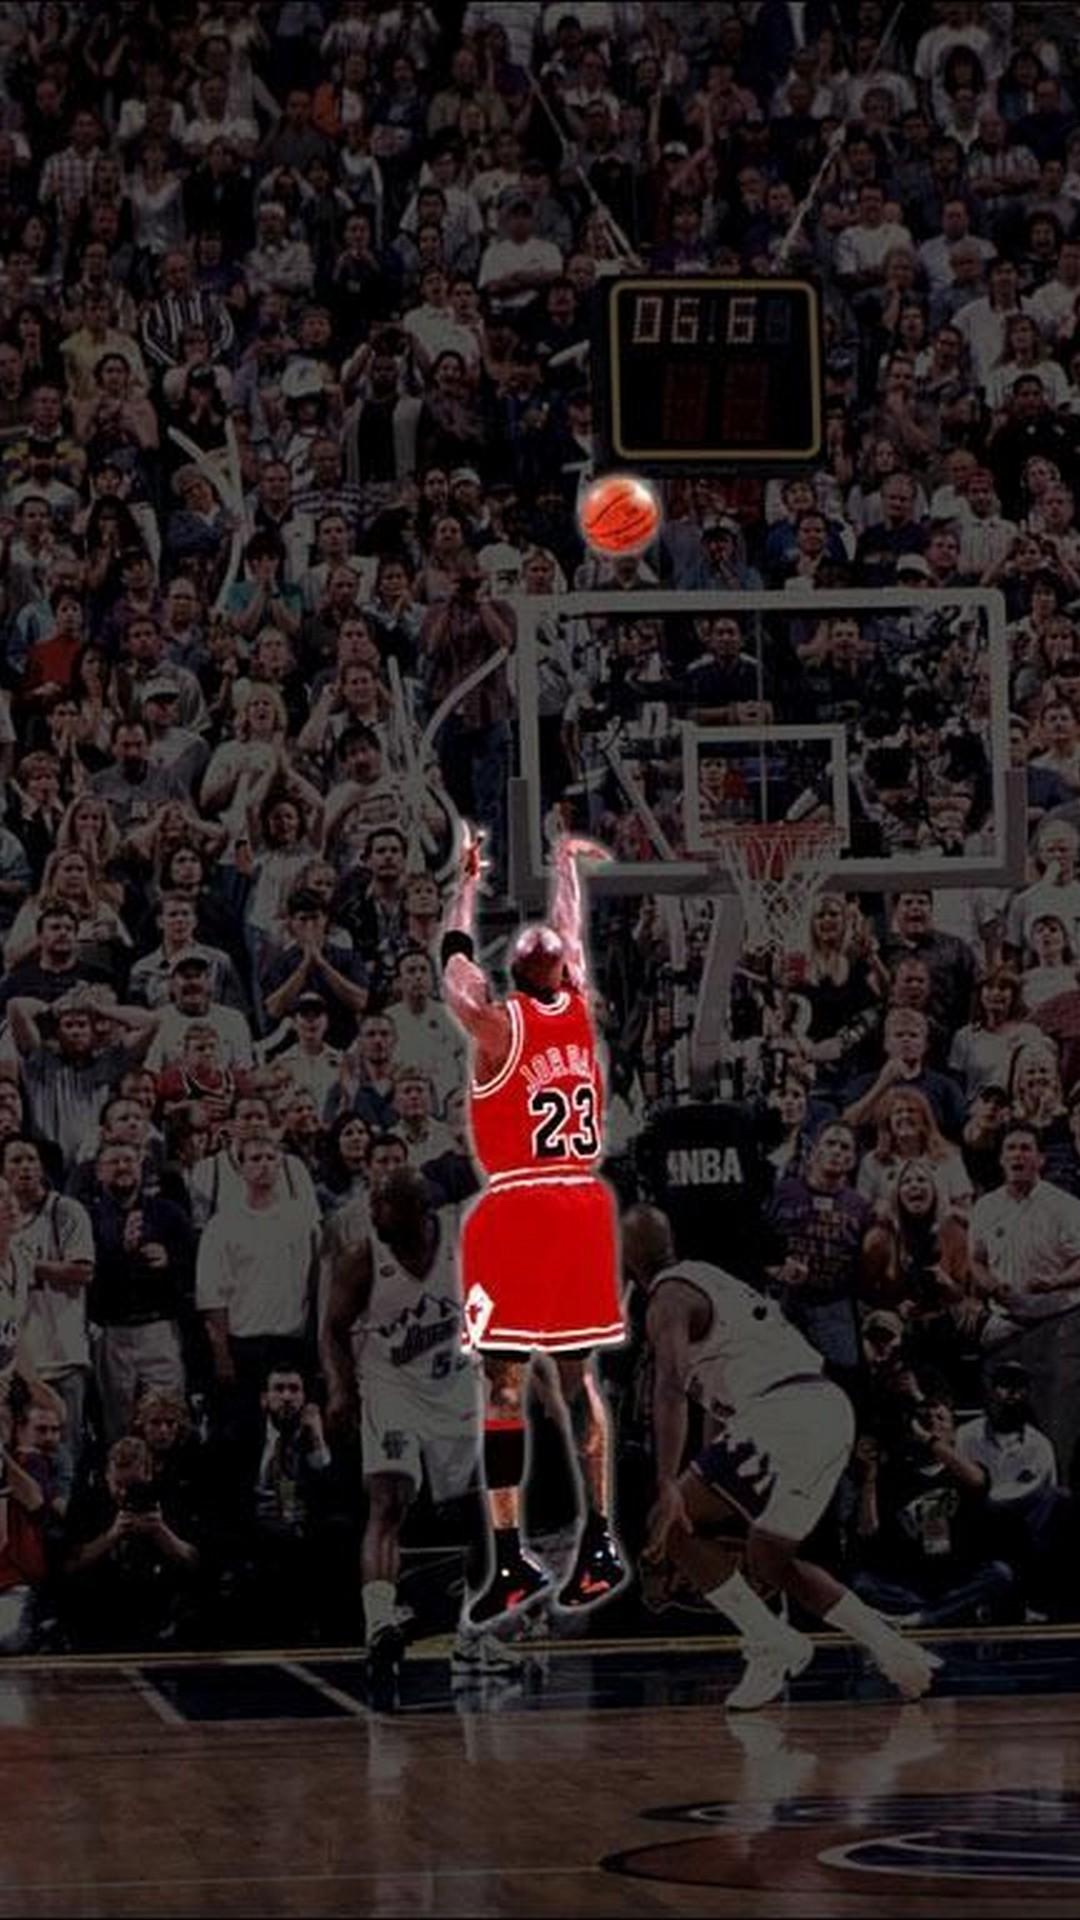 Wallpaper Basketball Mobile 2021 Basketball Wallpaper 1080x1920